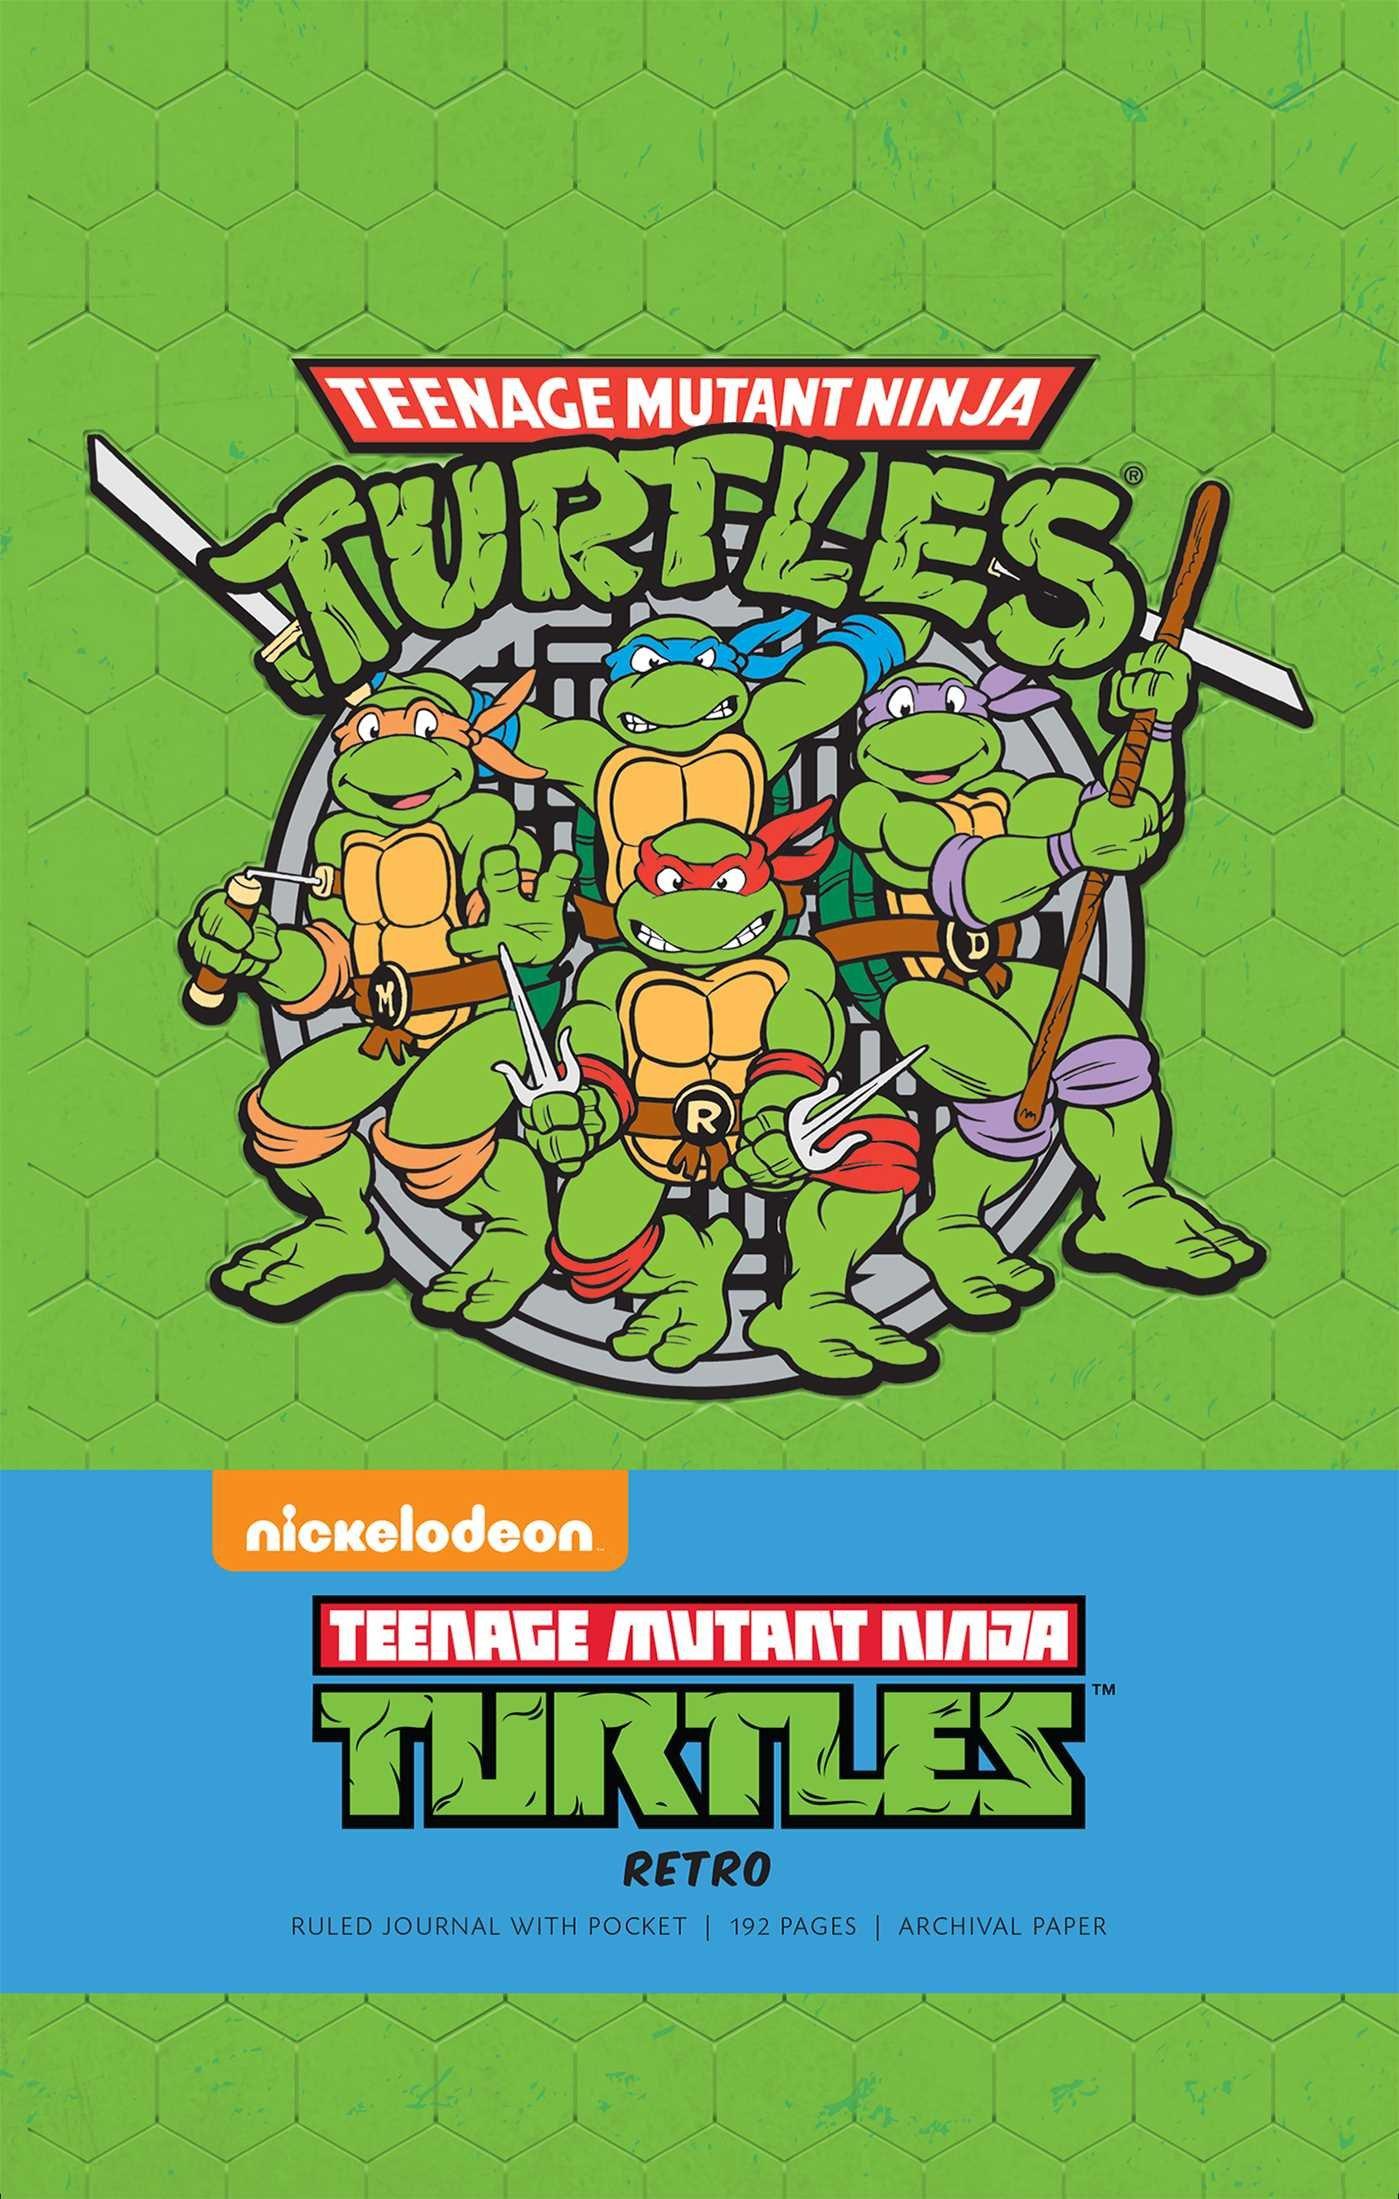 Amazon.com: Teenage Mutant Ninja Turtles Retro Hardcover ...